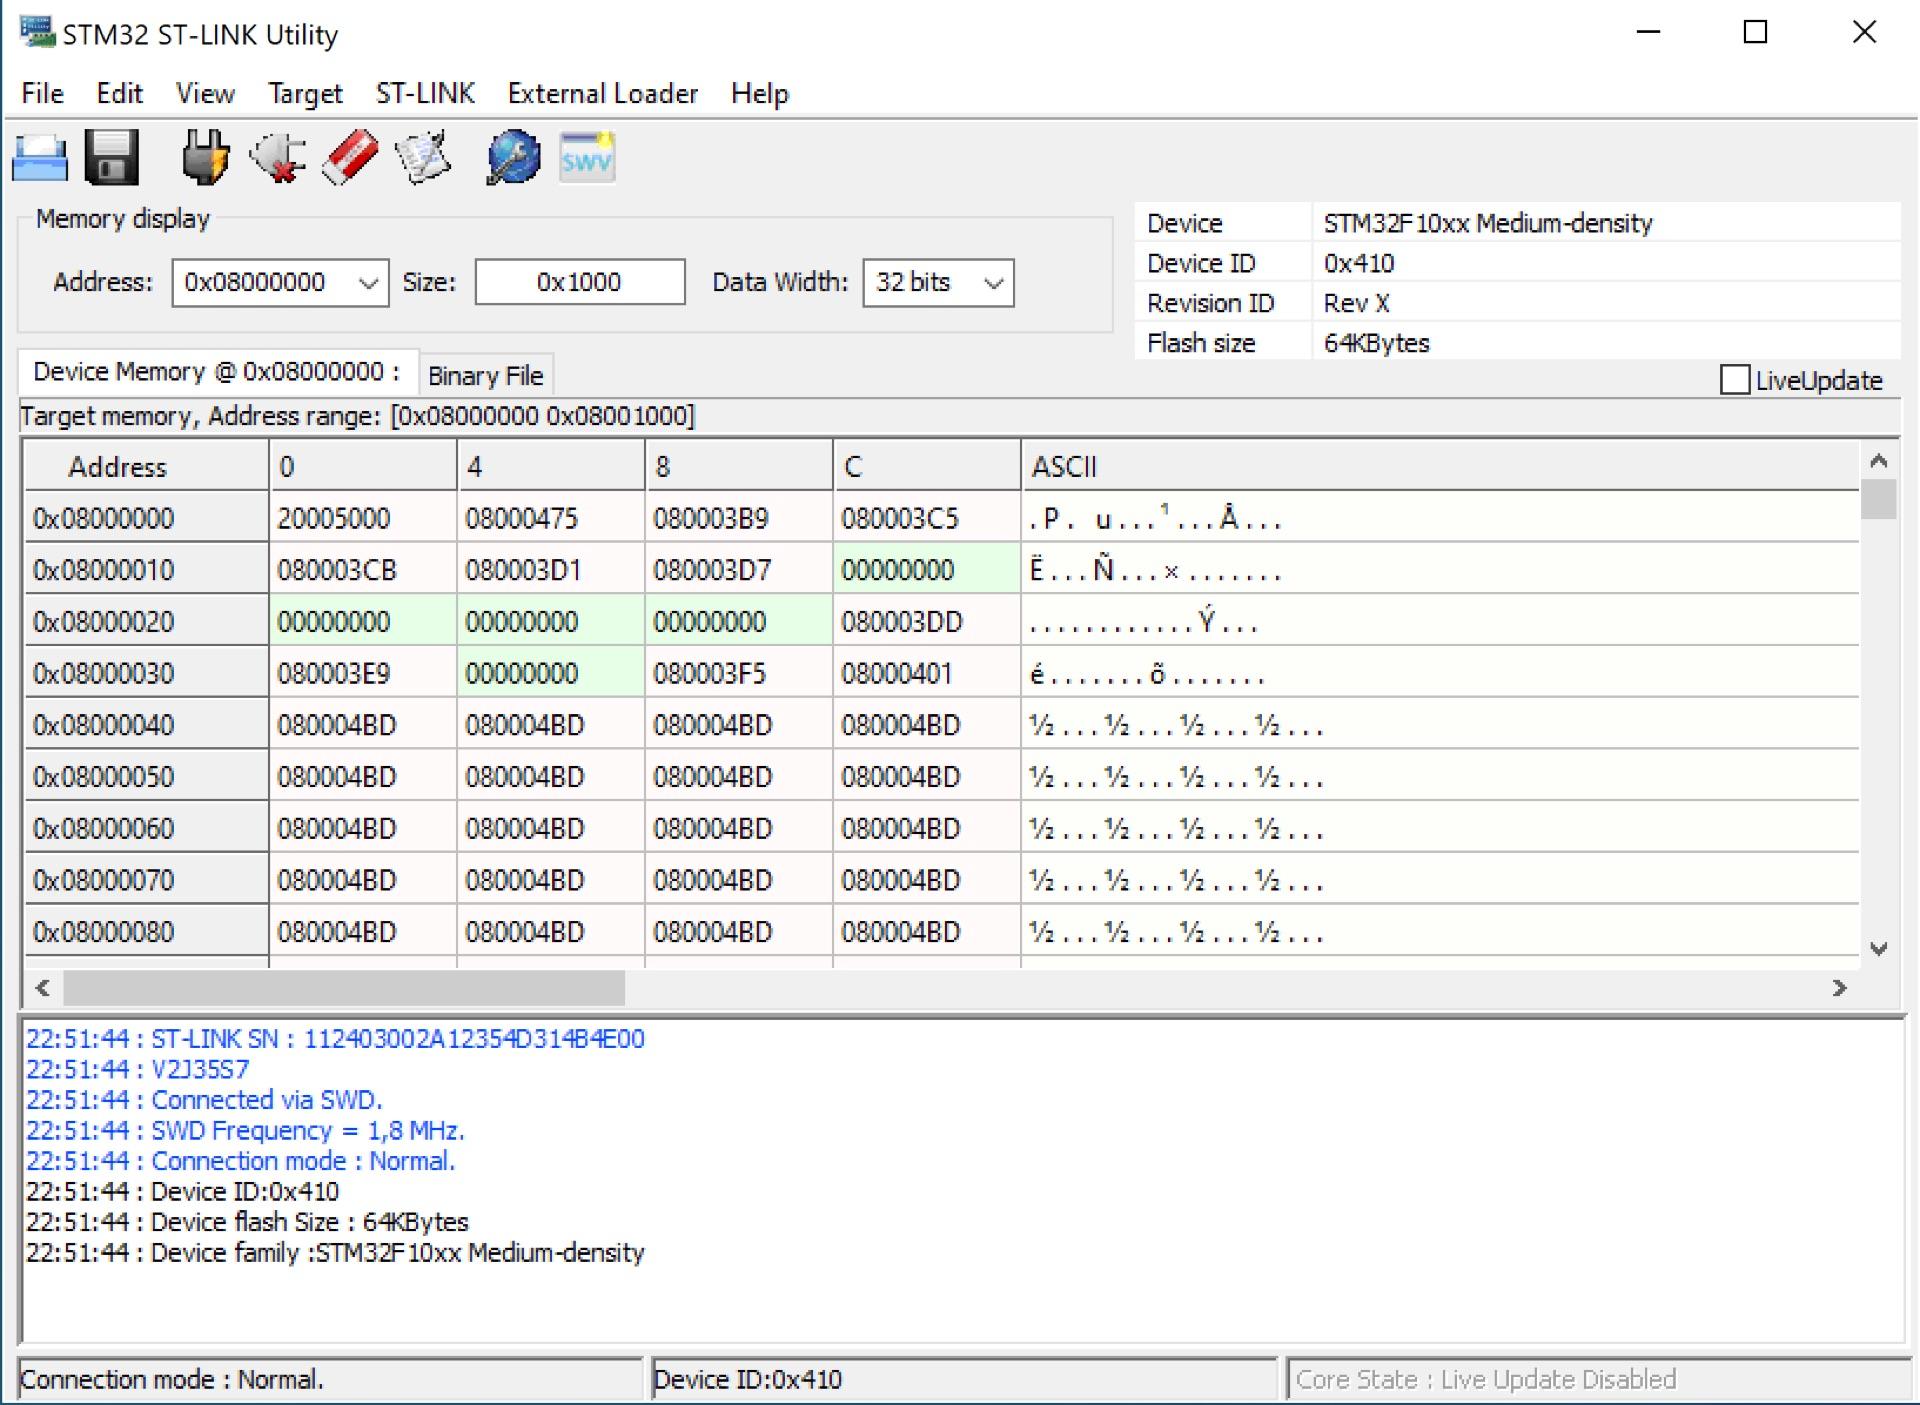 Figure 2: Screenshot of the STM32 ST-Link Utility